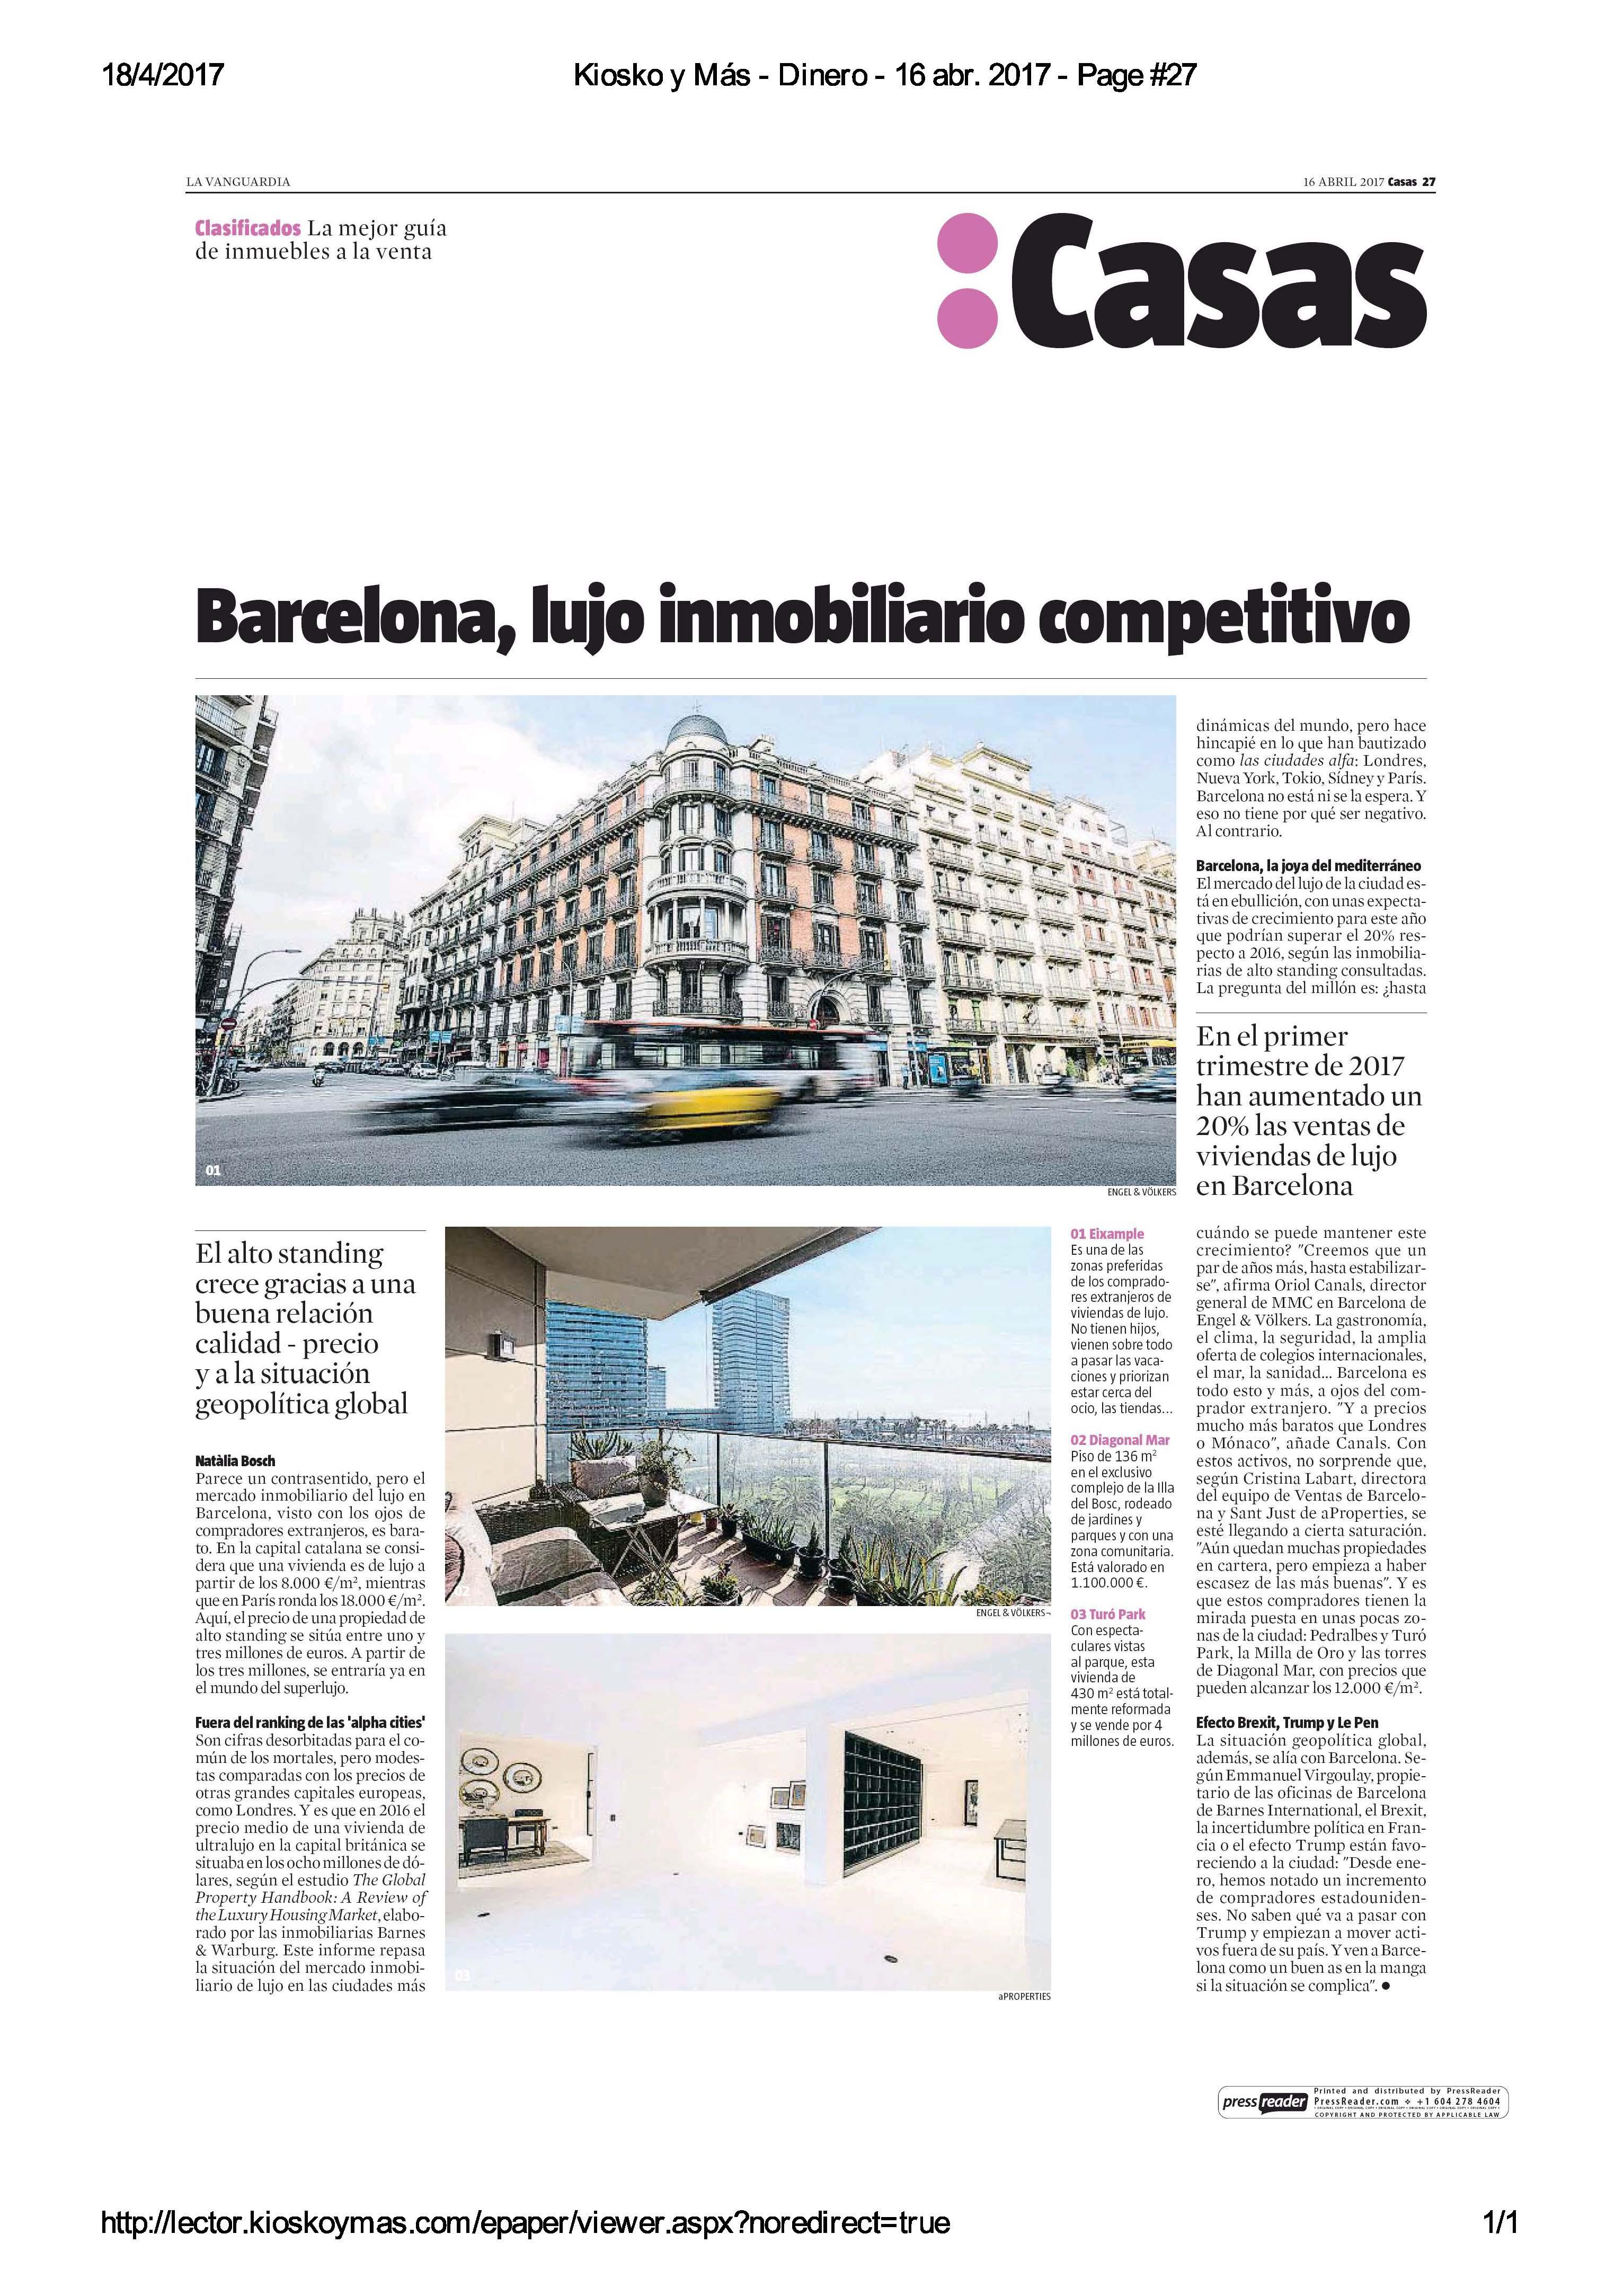 https://whiterabbit.es/wp-content/uploads/2017/04/Estudio-Barnes_La-Vanguardia-Dinero_22.500vp.jpg